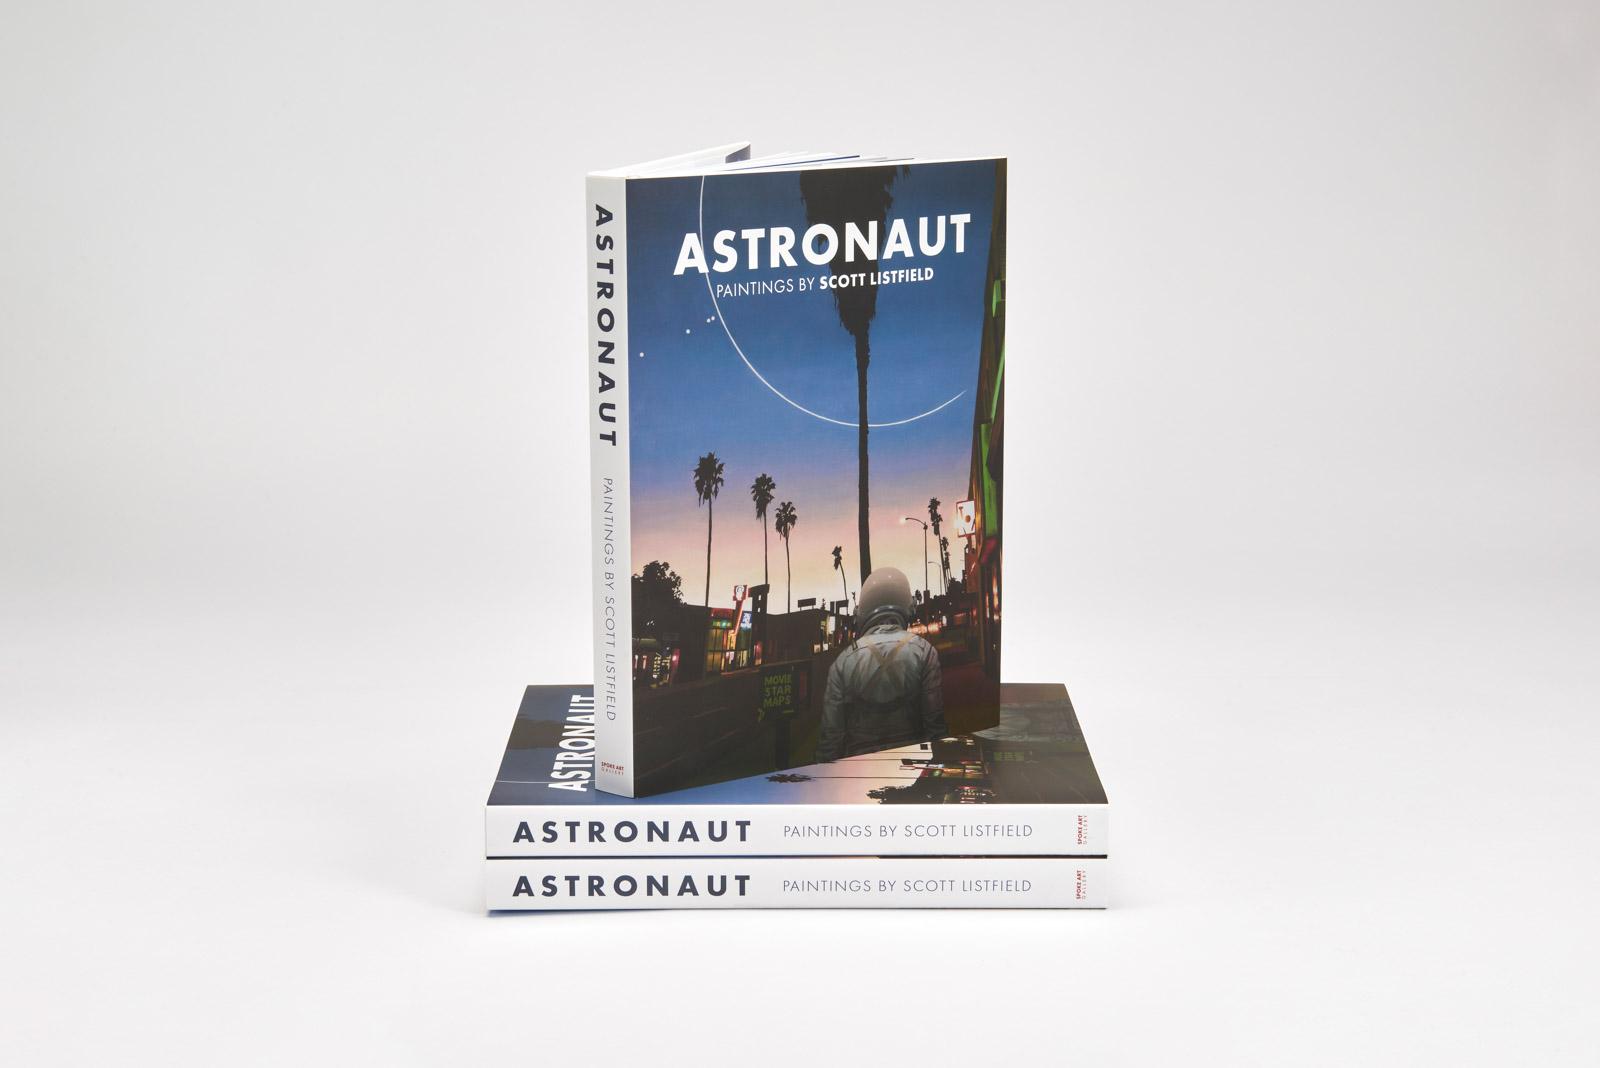 -Astronaut-Spread-1600px-3.jpg